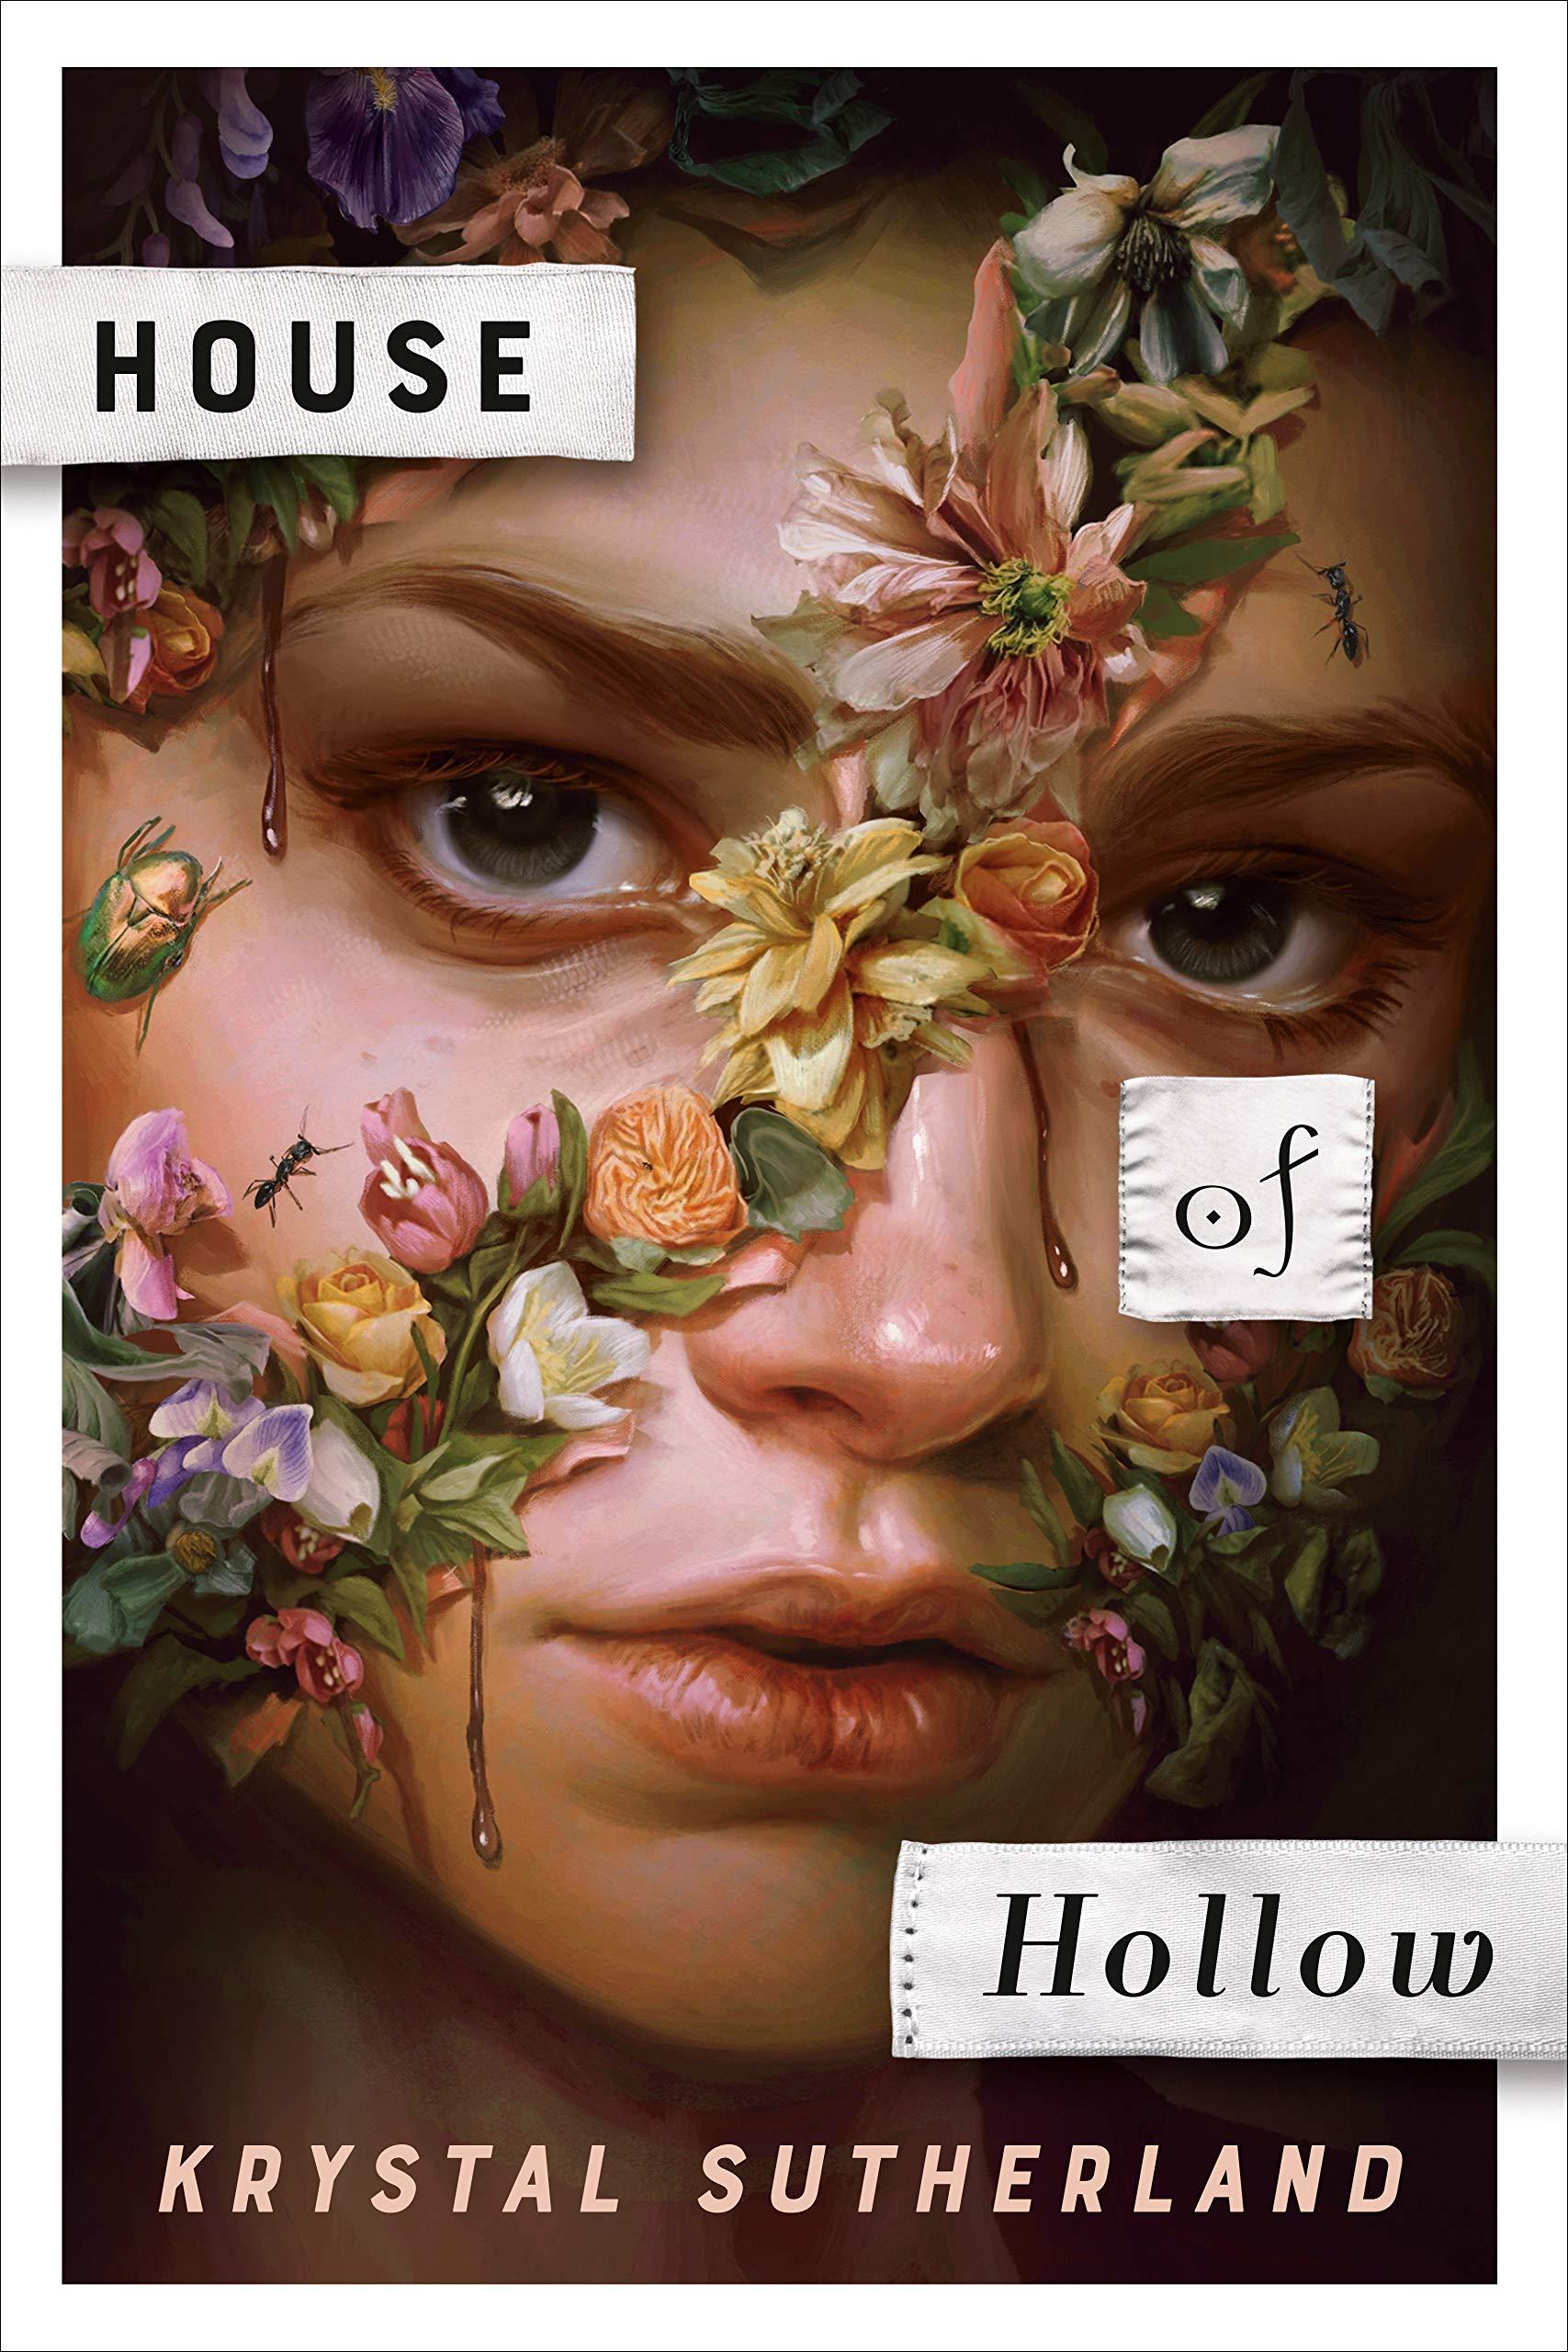 Amazon.com: House of Hollow (9780593110348): Sutherland, Krystal: Books